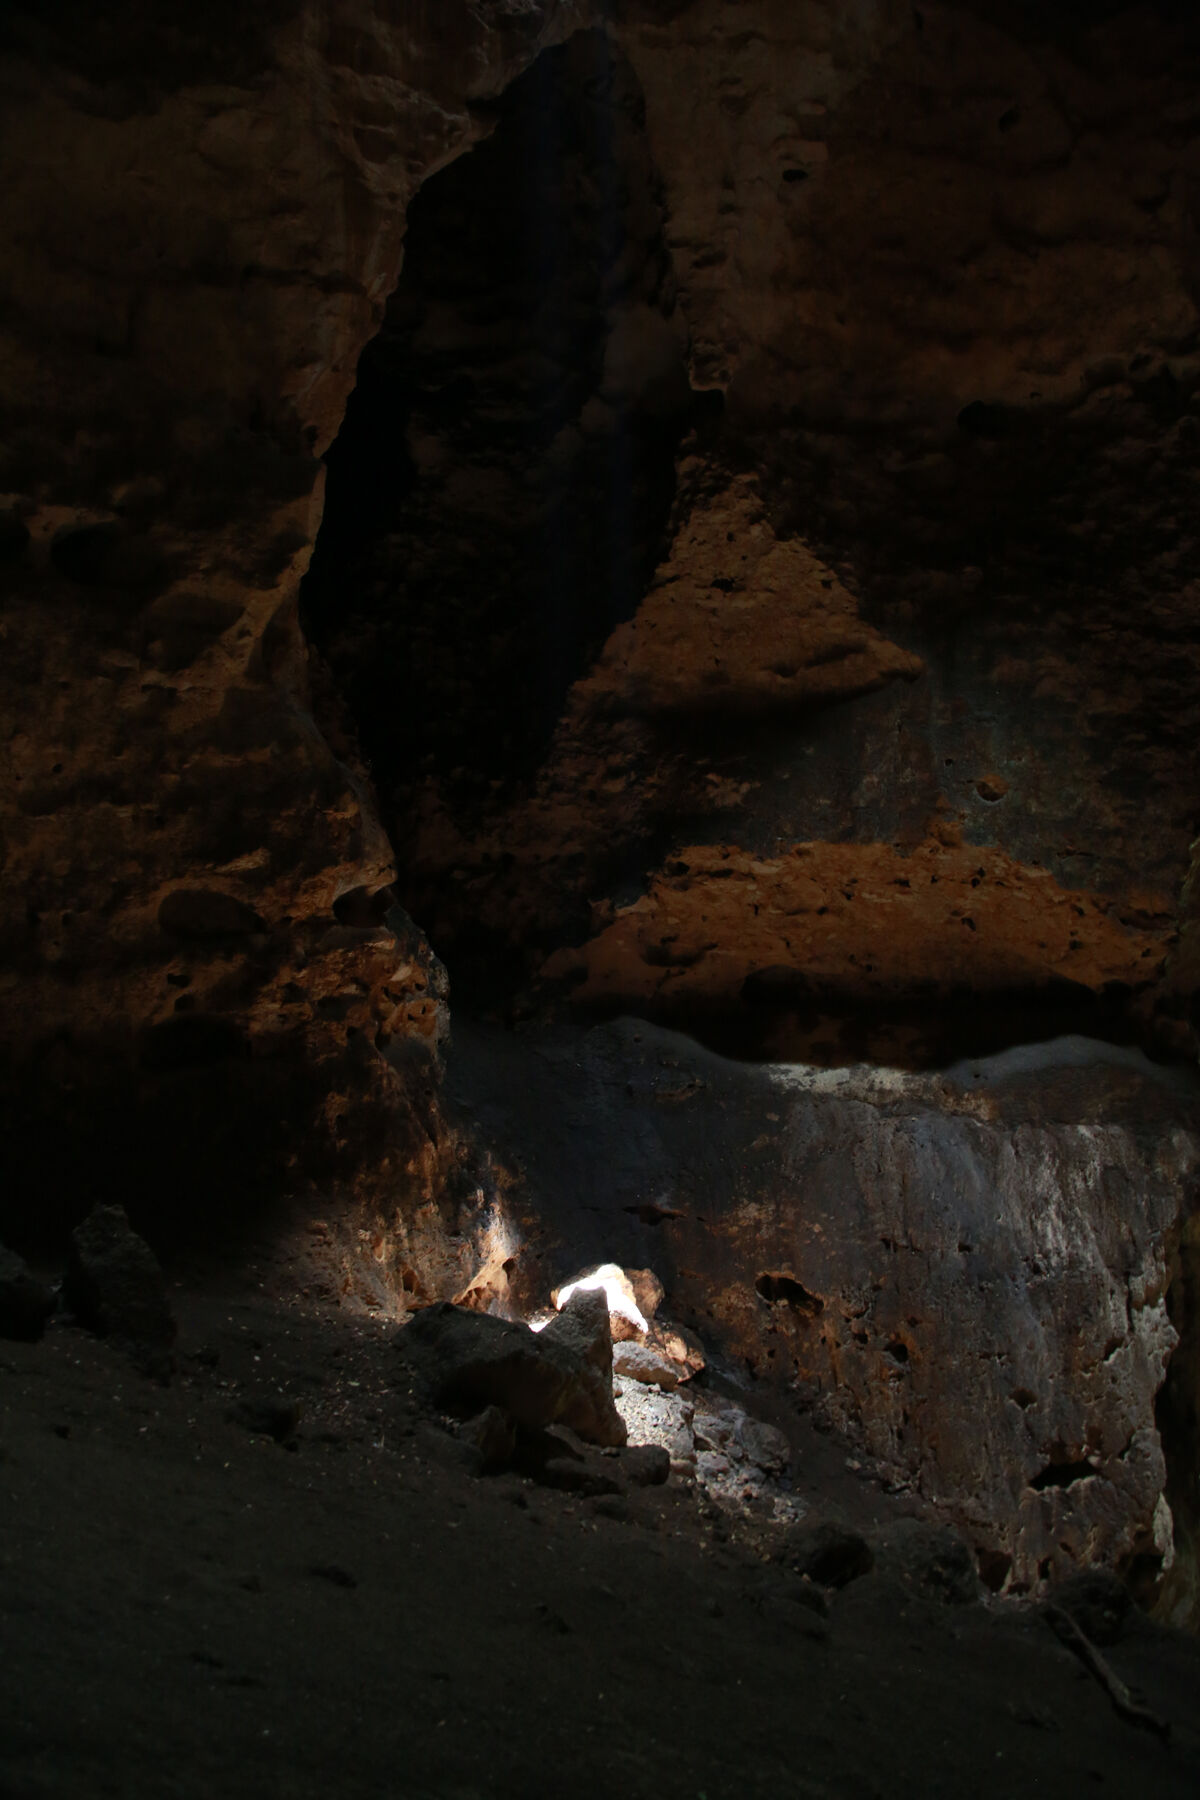 Allora & Calzadilla, Puerto Rican Light (Cueva Vientos), 2015. Guayanilla-Peñuelas, Puerto Rico. © Allora & Calzadilla. Photo by Myritza Castillo. Courtesy of Dia.